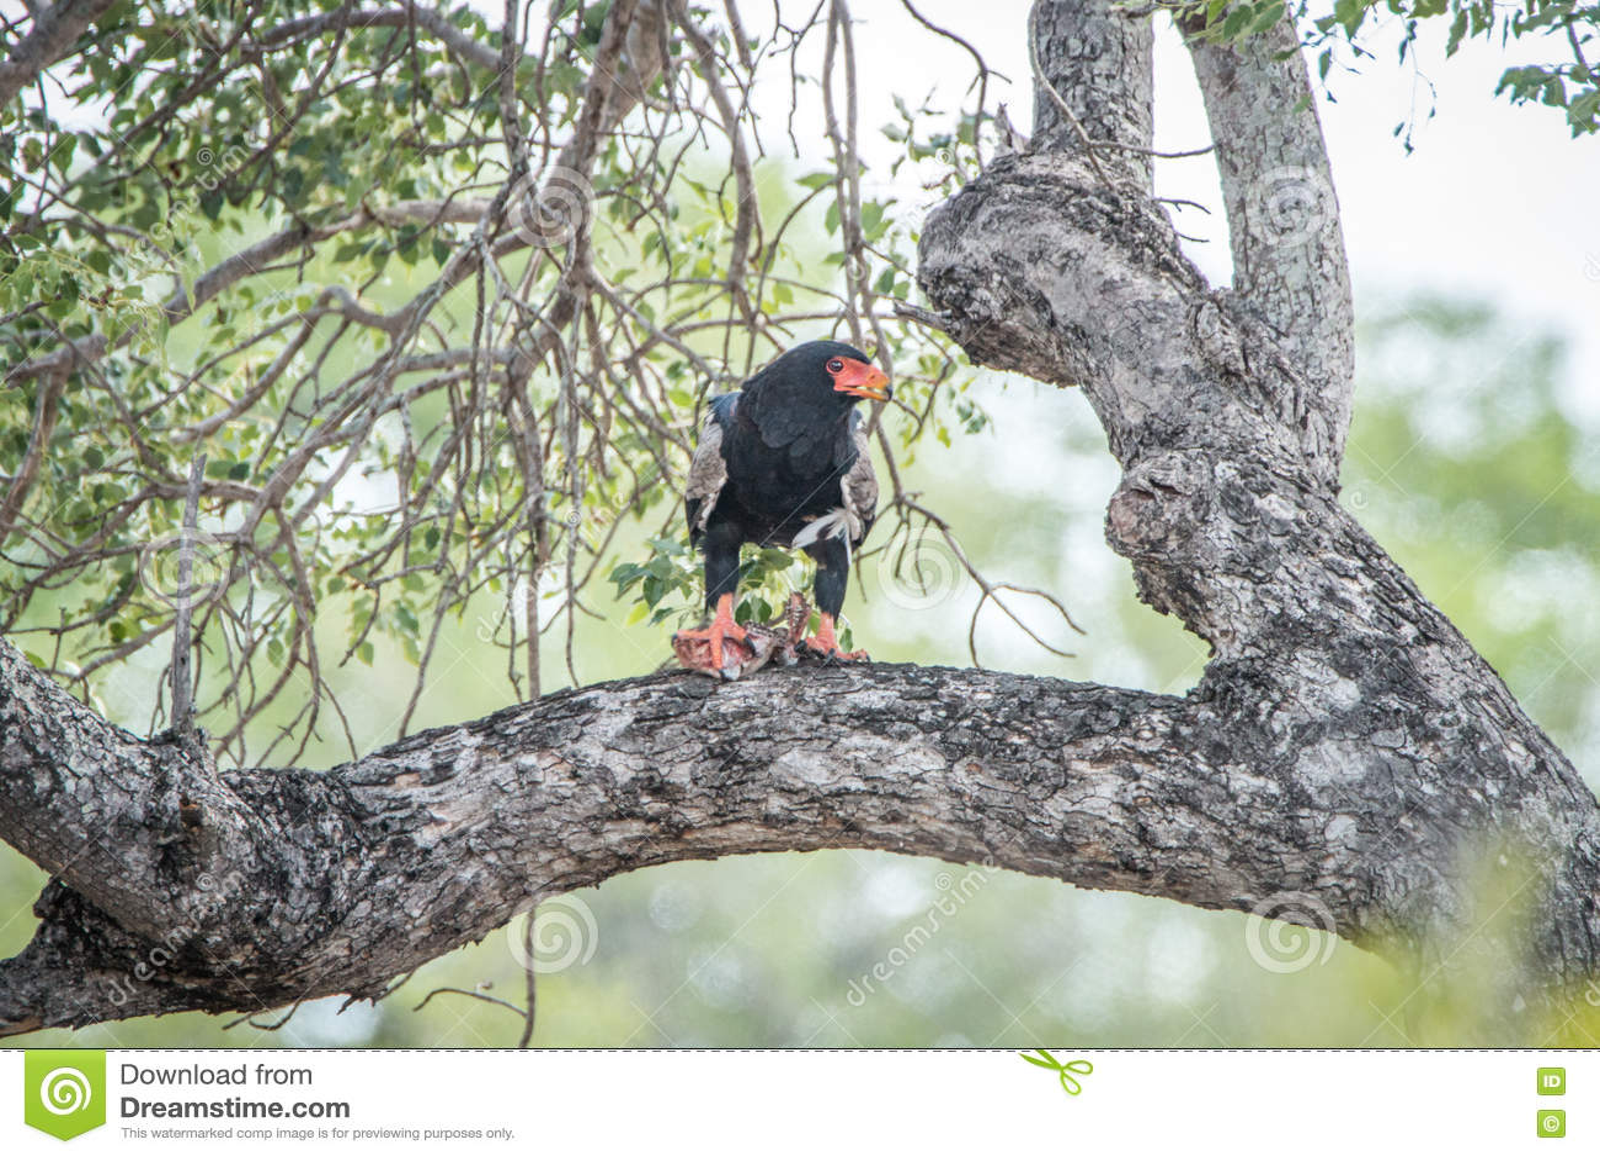 Bateleur eating in a tree.